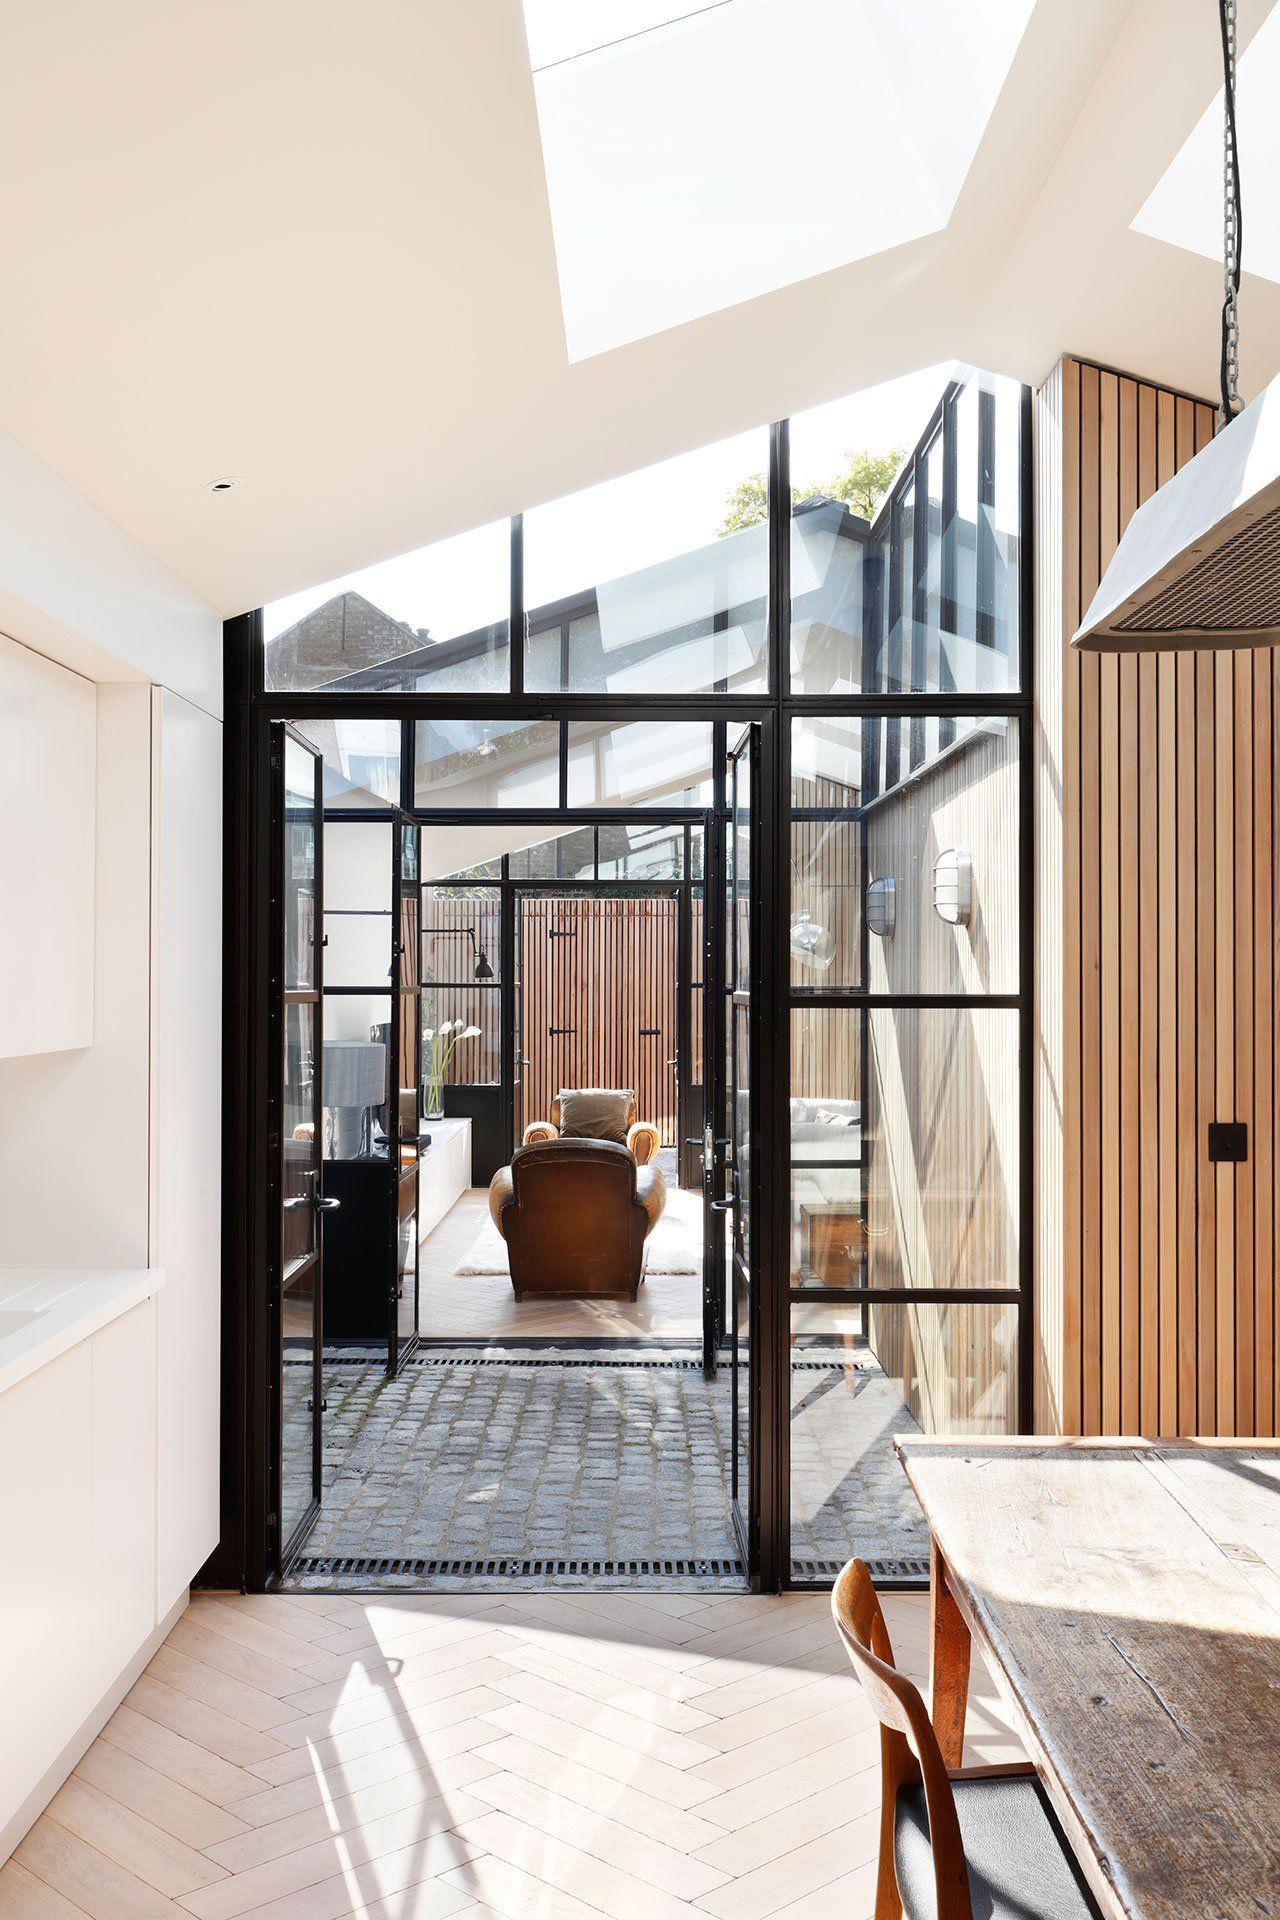 Photography alex james via yatzer sweet home make sweethomemake interior decoration design ideas decor also rh pinterest